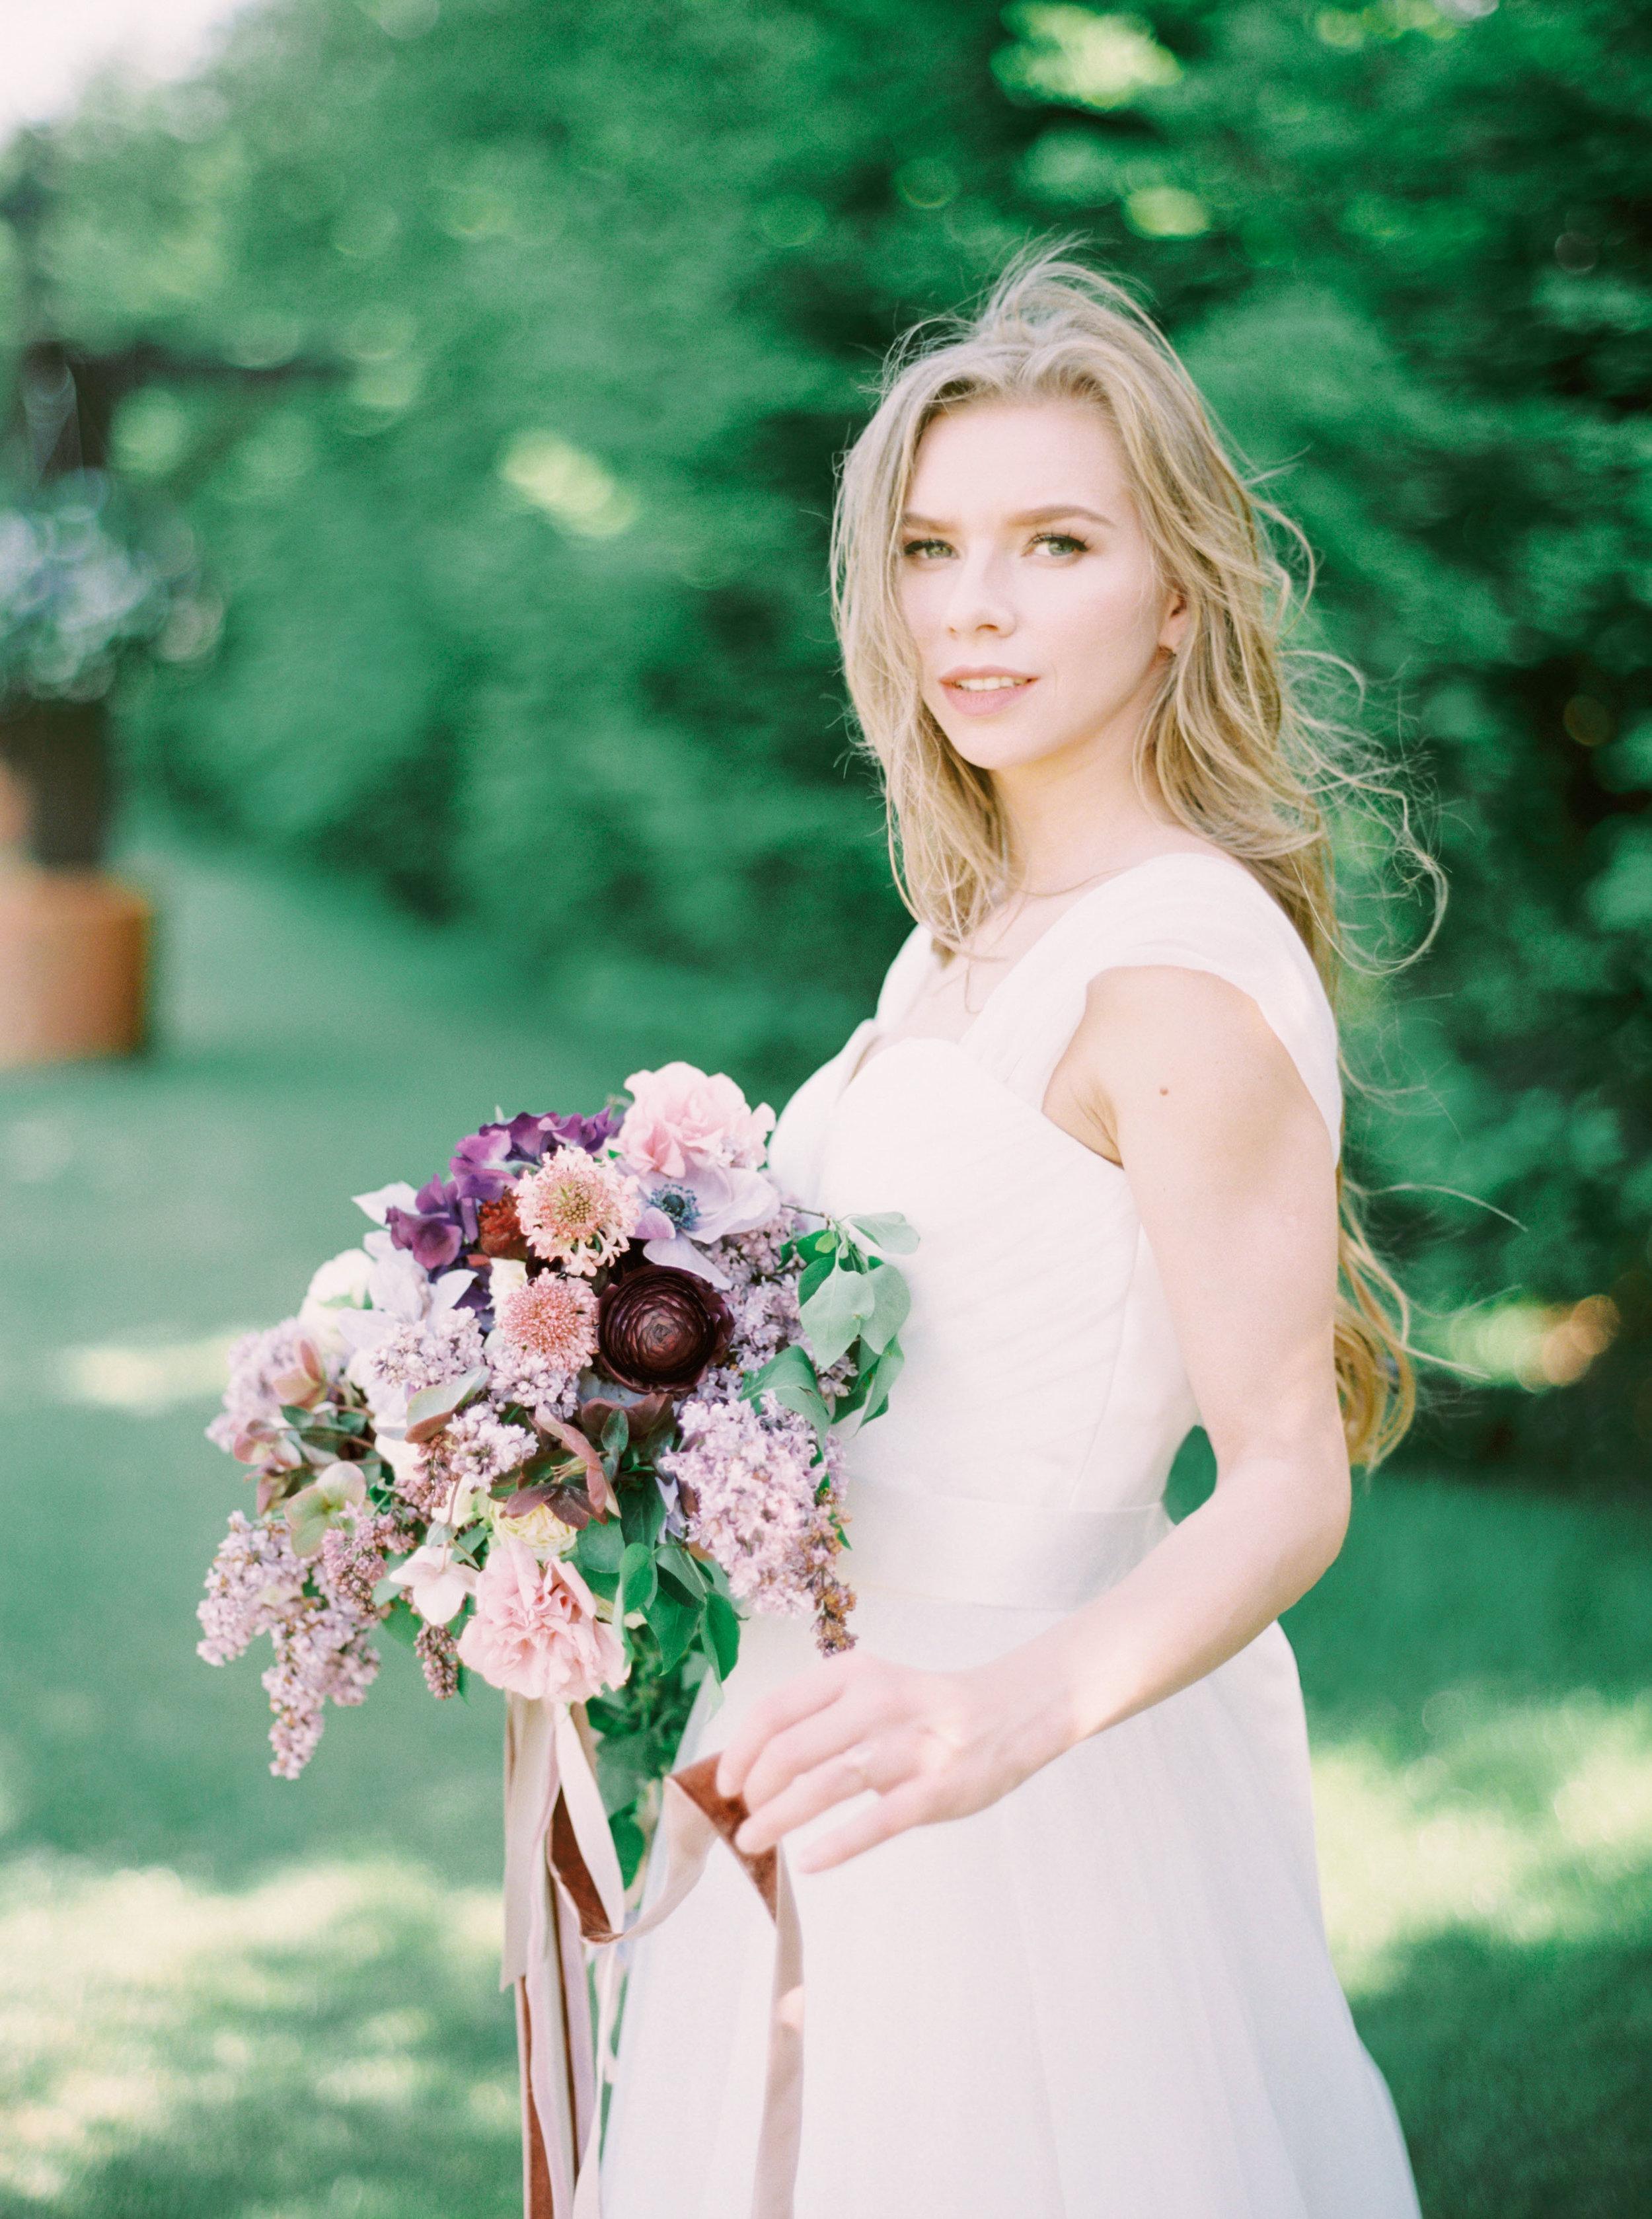 This-Love-of-Yours-Kirigin-Cellars-Flower-Arch-Styled-Shoot-091.jpg